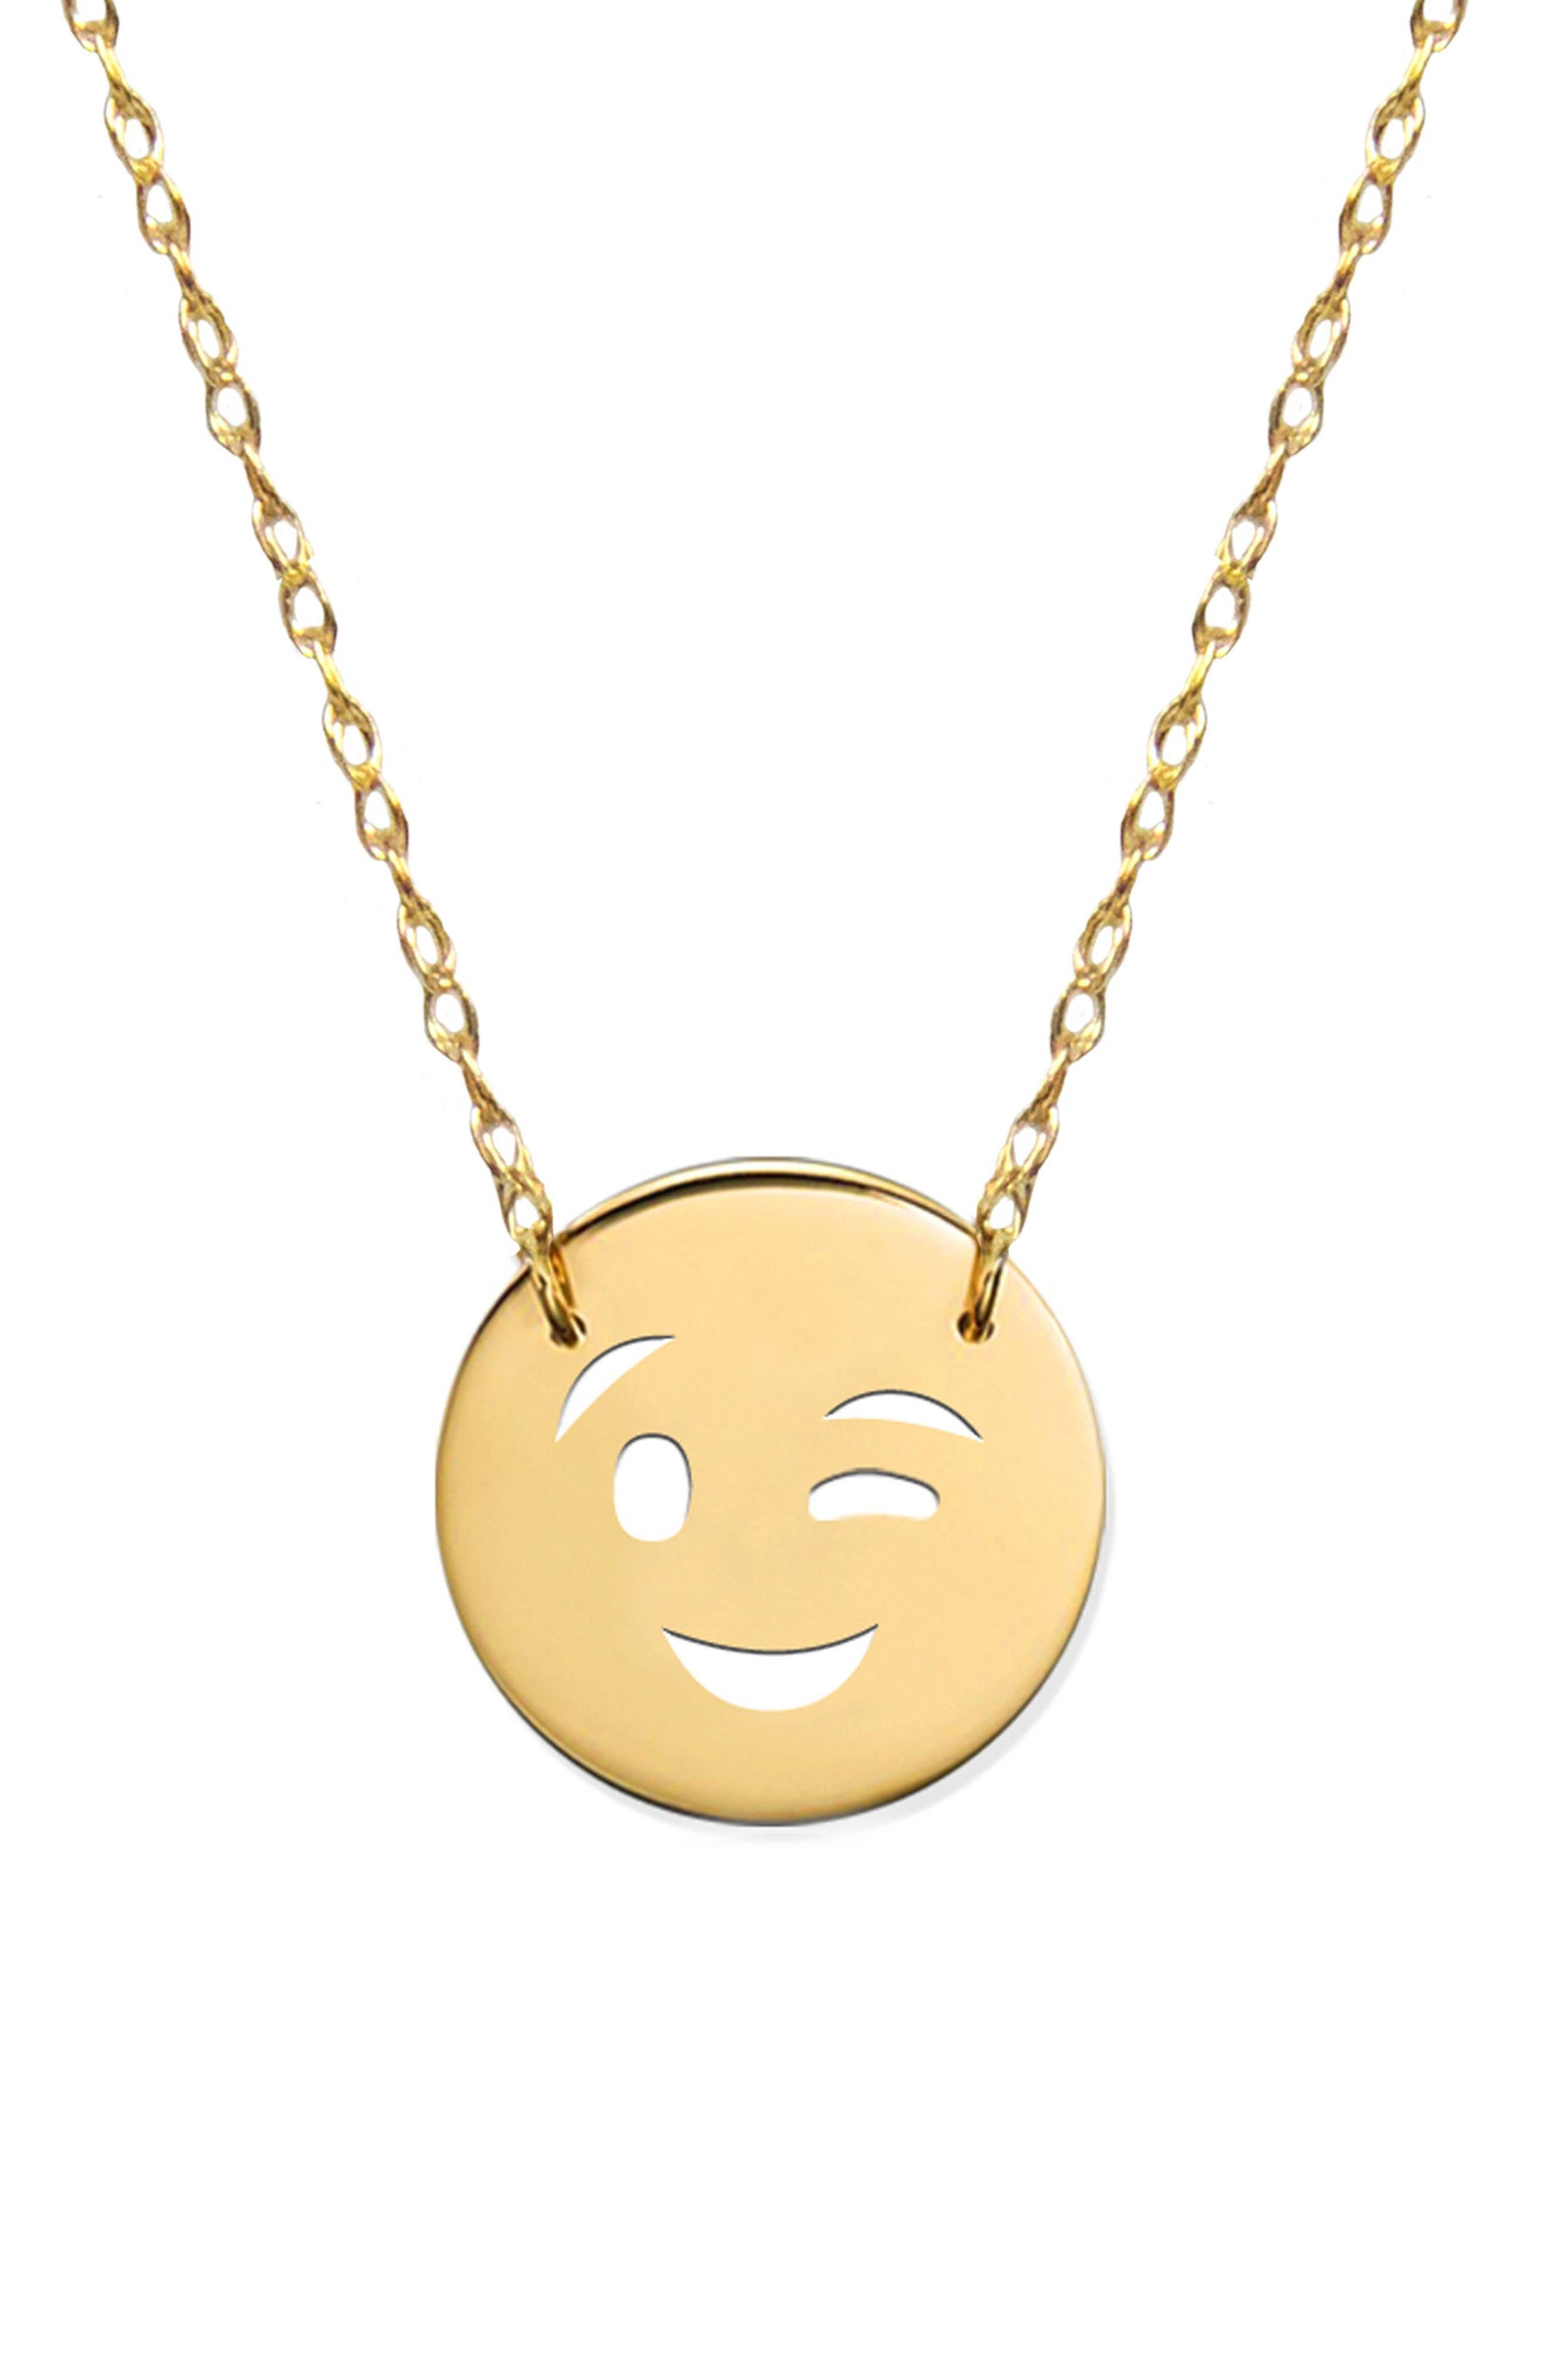 Wink Emoji Pendant Necklace,                             Main thumbnail 1, color,                             Yellow Gold